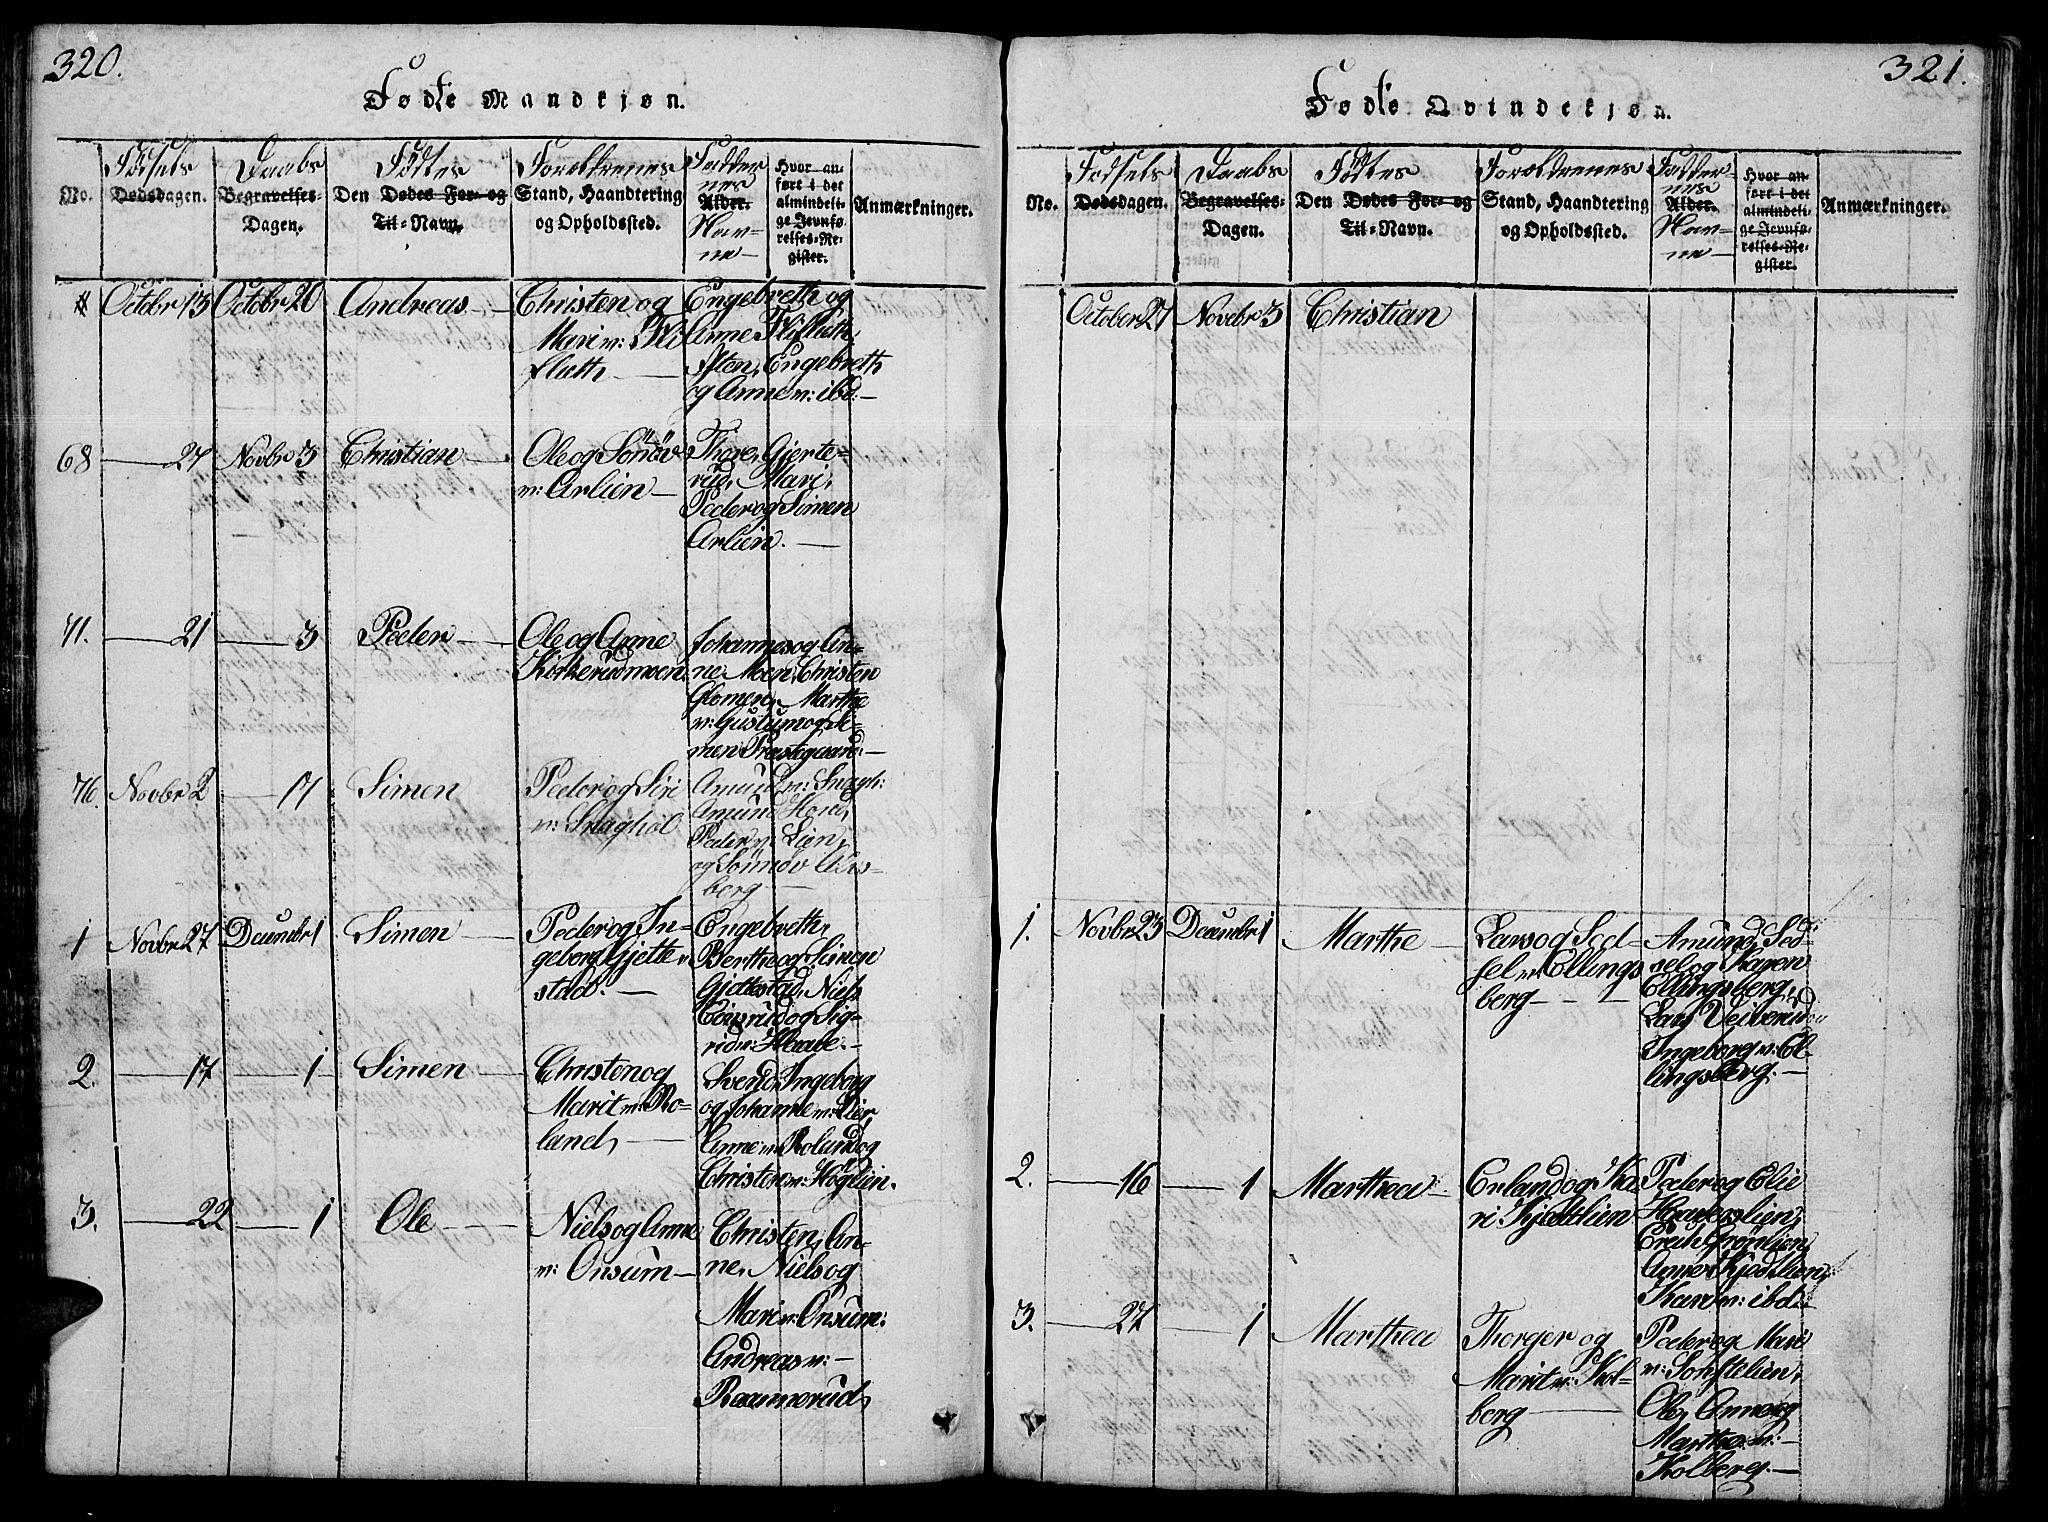 SAH, Fåberg prestekontor, Klokkerbok nr. 4, 1818-1837, s. 320-321